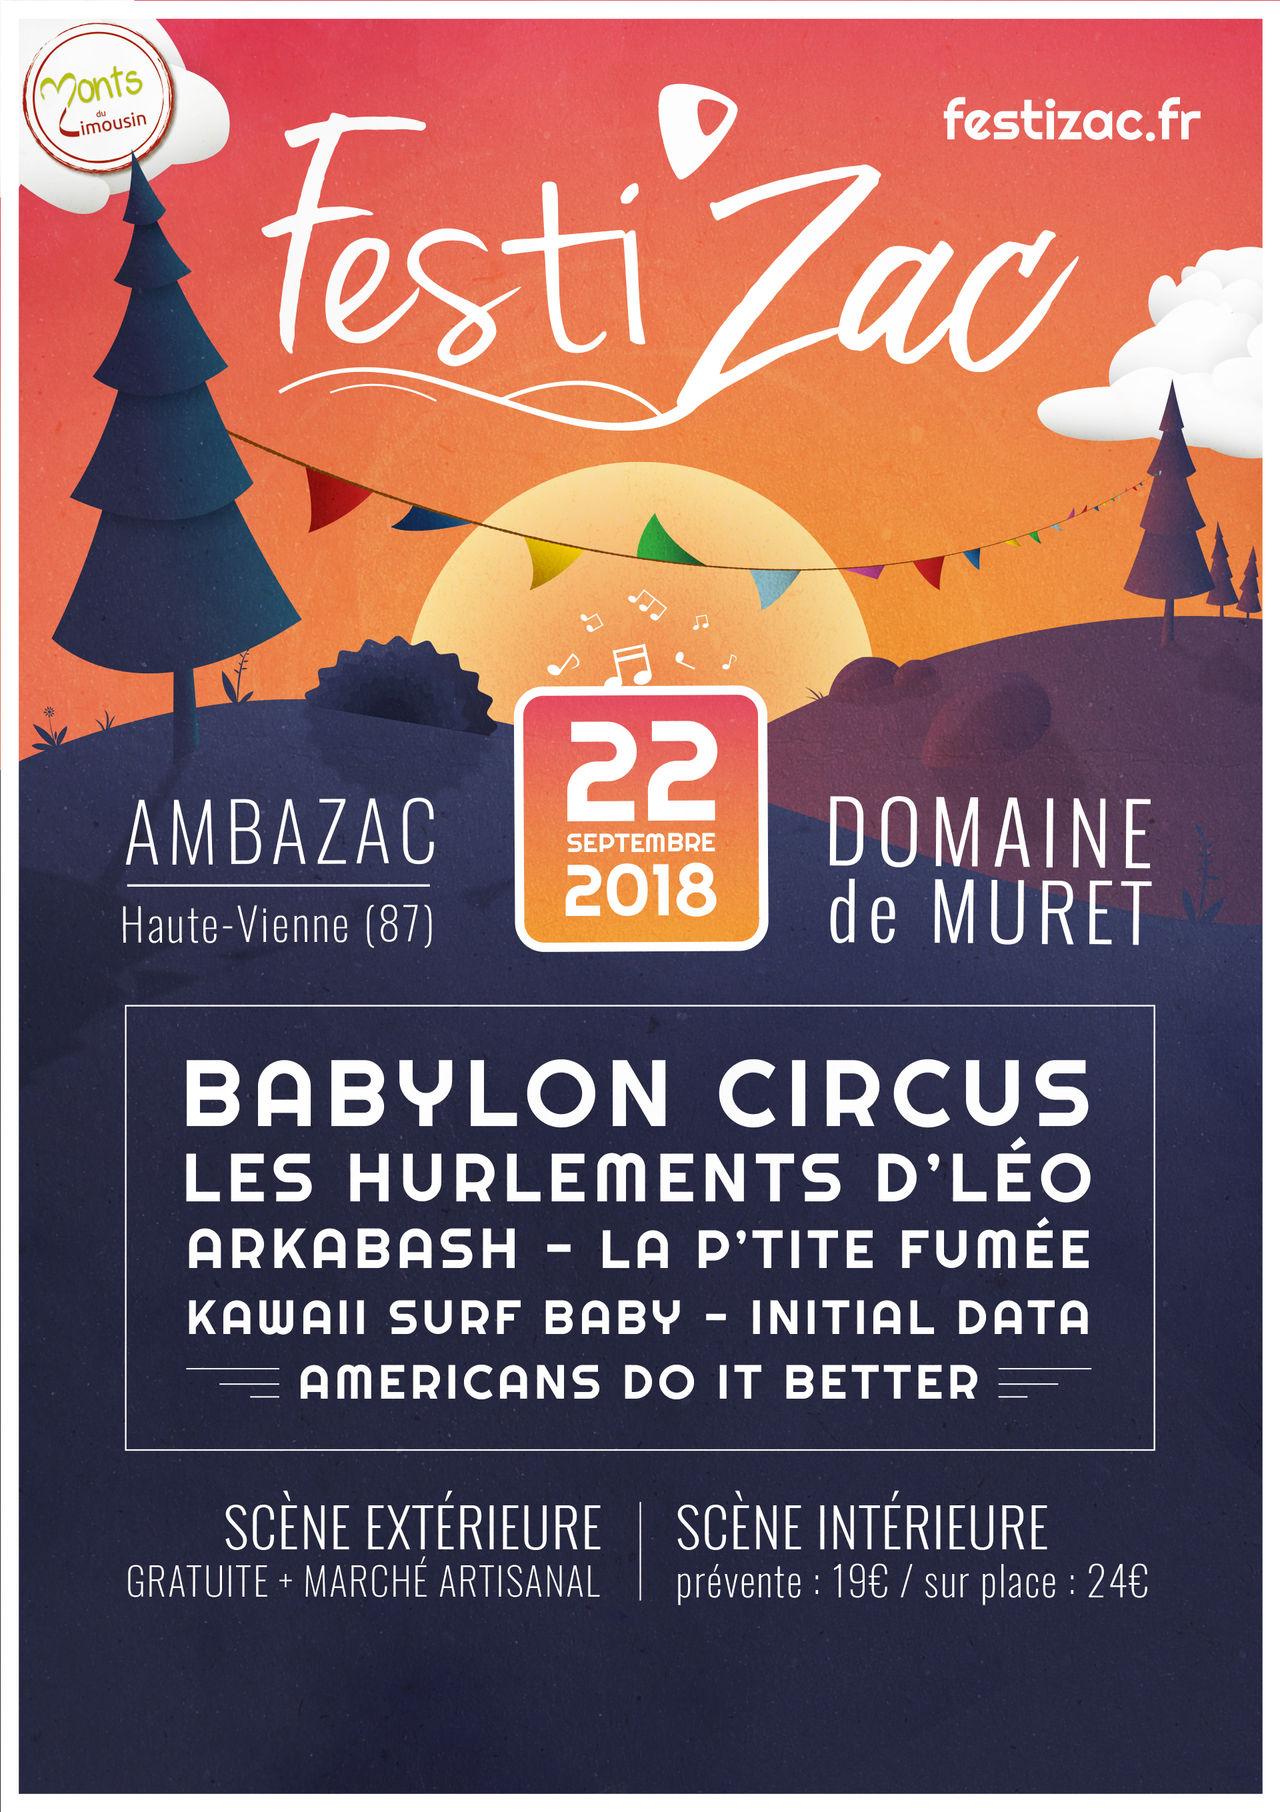 Affiche Festival Festi'Zac